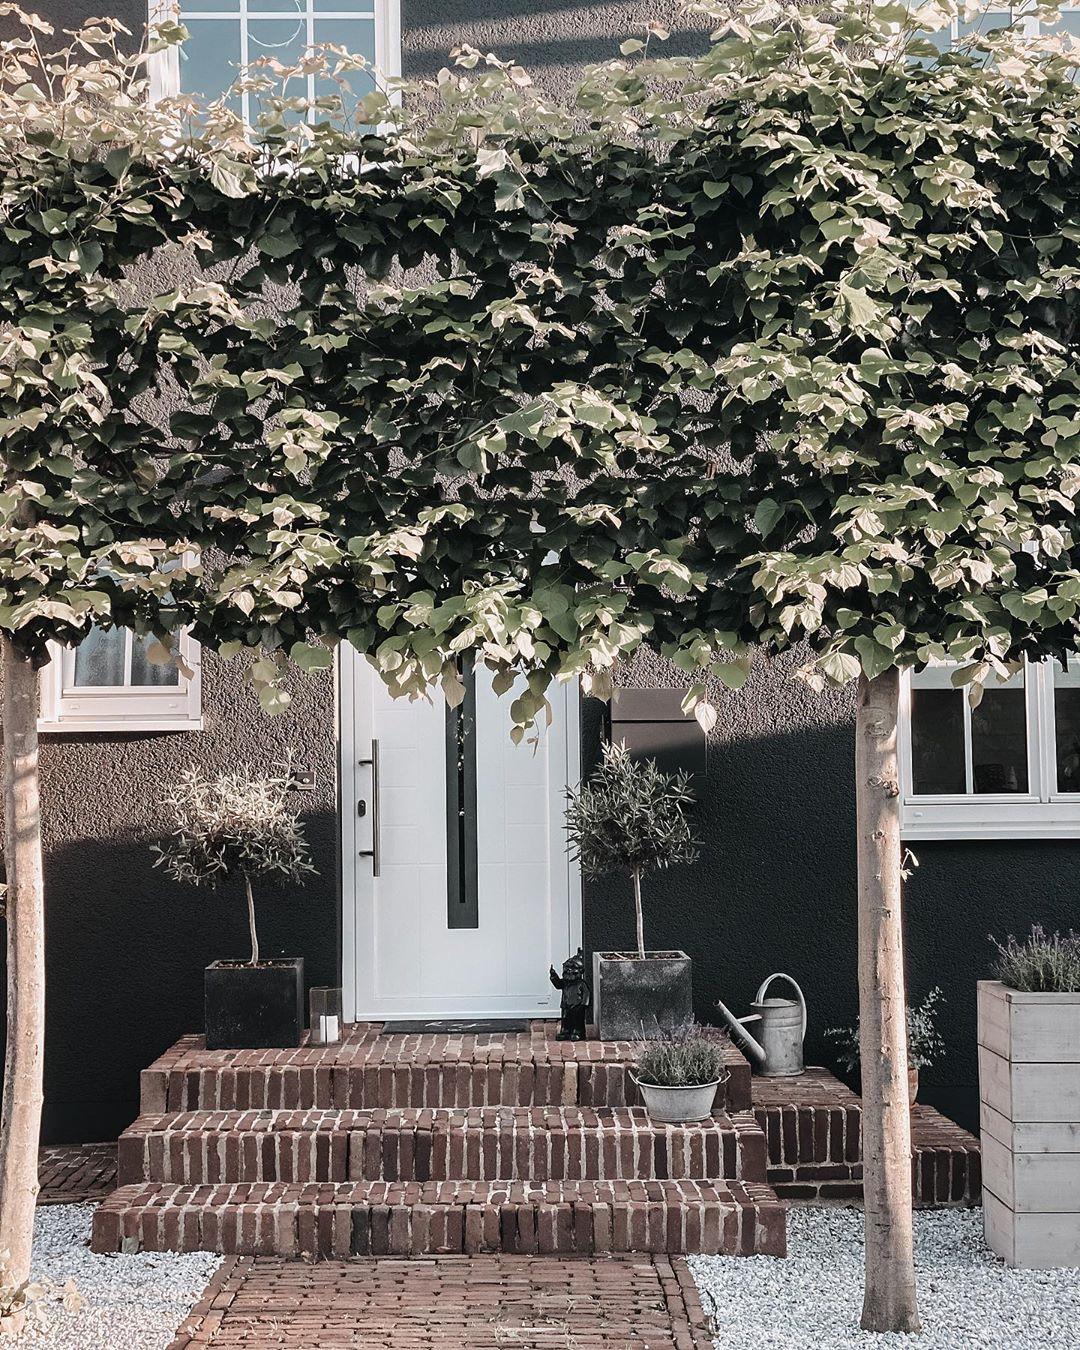 Girly Minimal: Πώς θα χαρίσεις θηλυκότητα σε ένα λιτό σπίτι